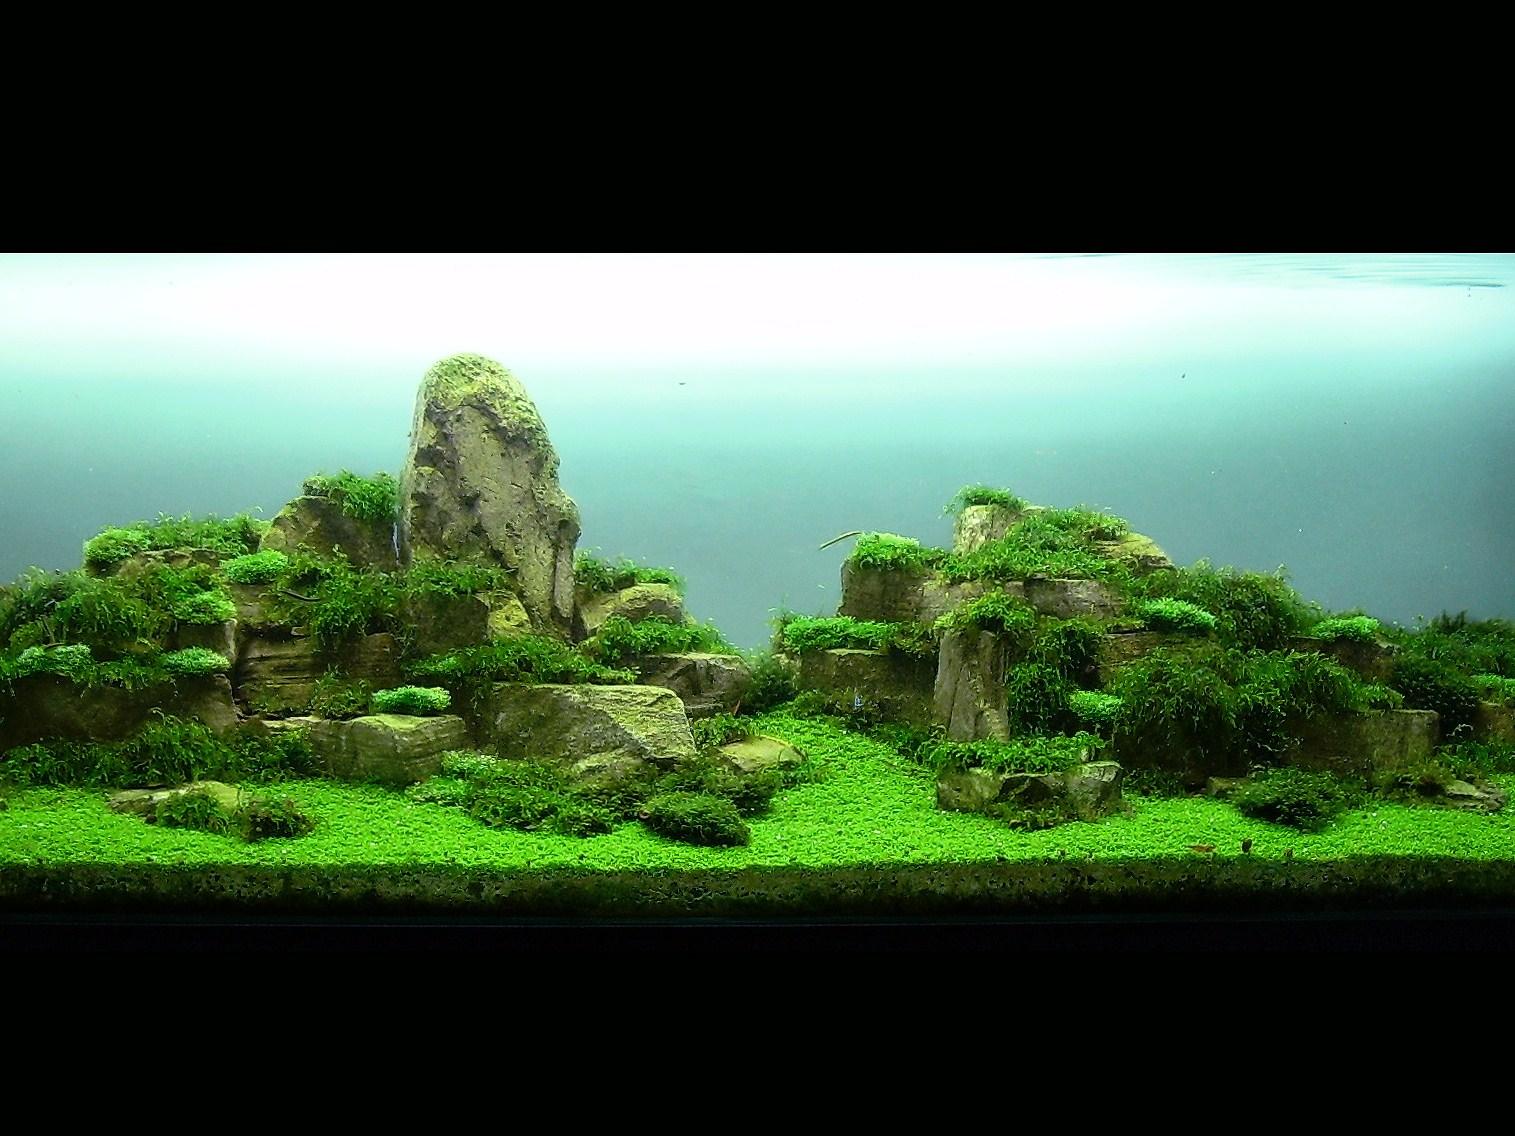 Pin Aquascaping Tag Aquascape Go Green Adalah Seni on Pinterest